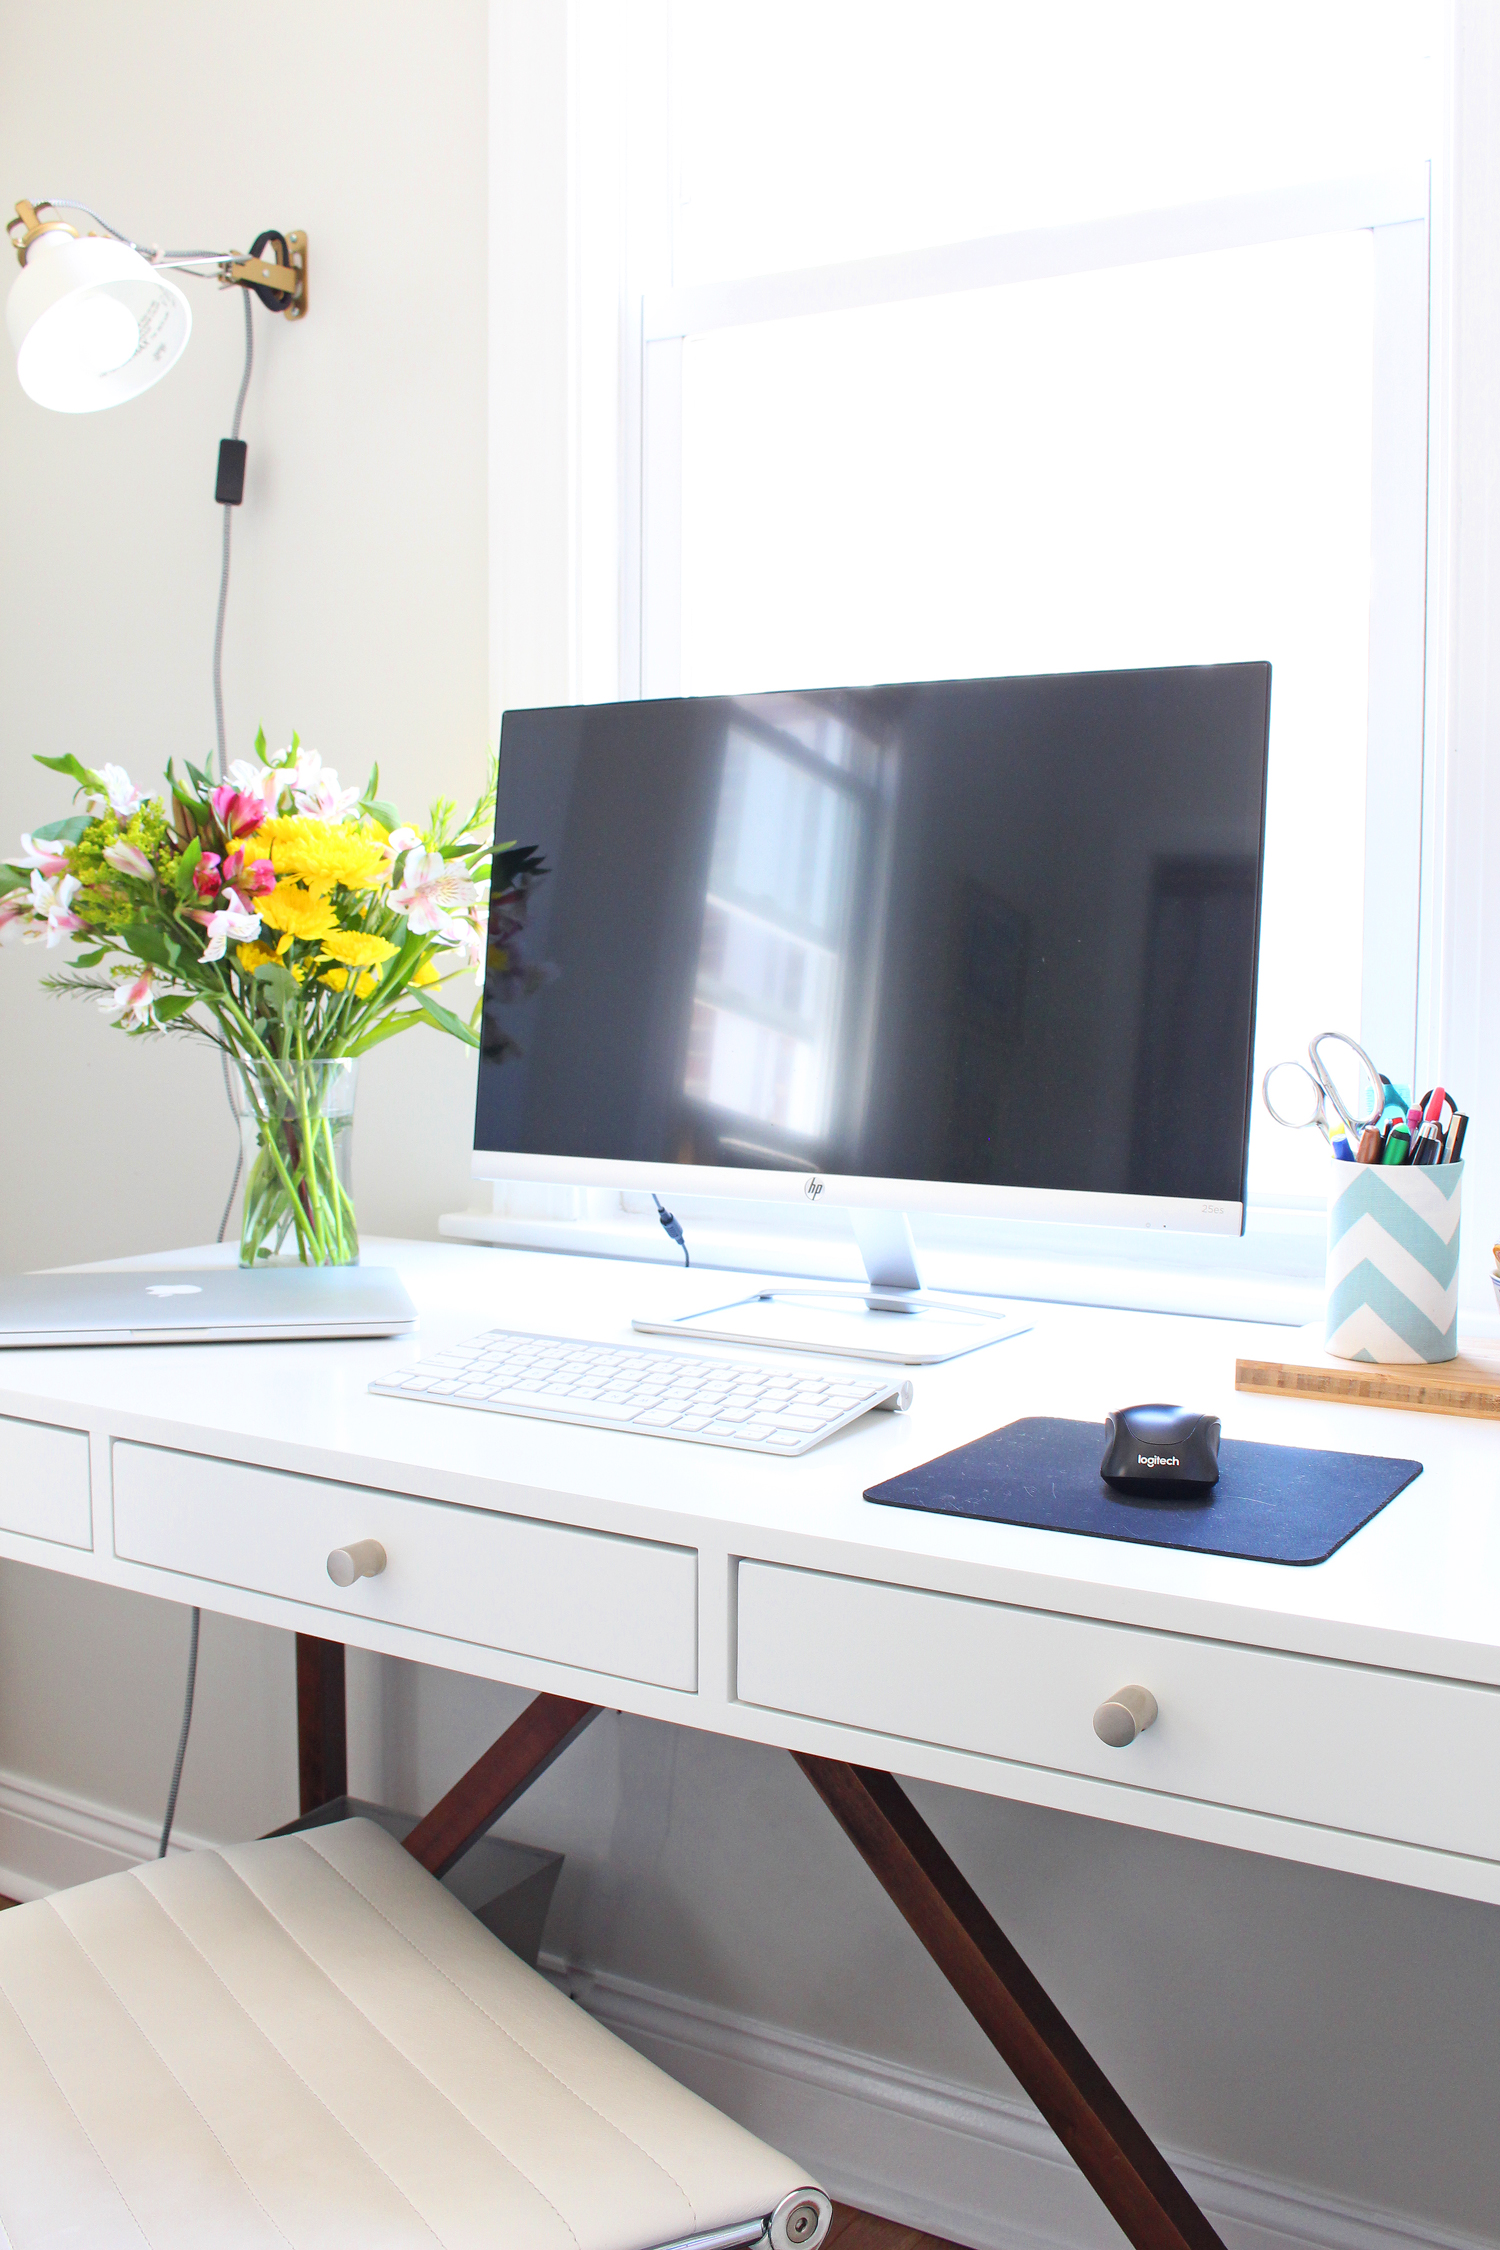 Sleek and modern desk for Mix & Match's home office.